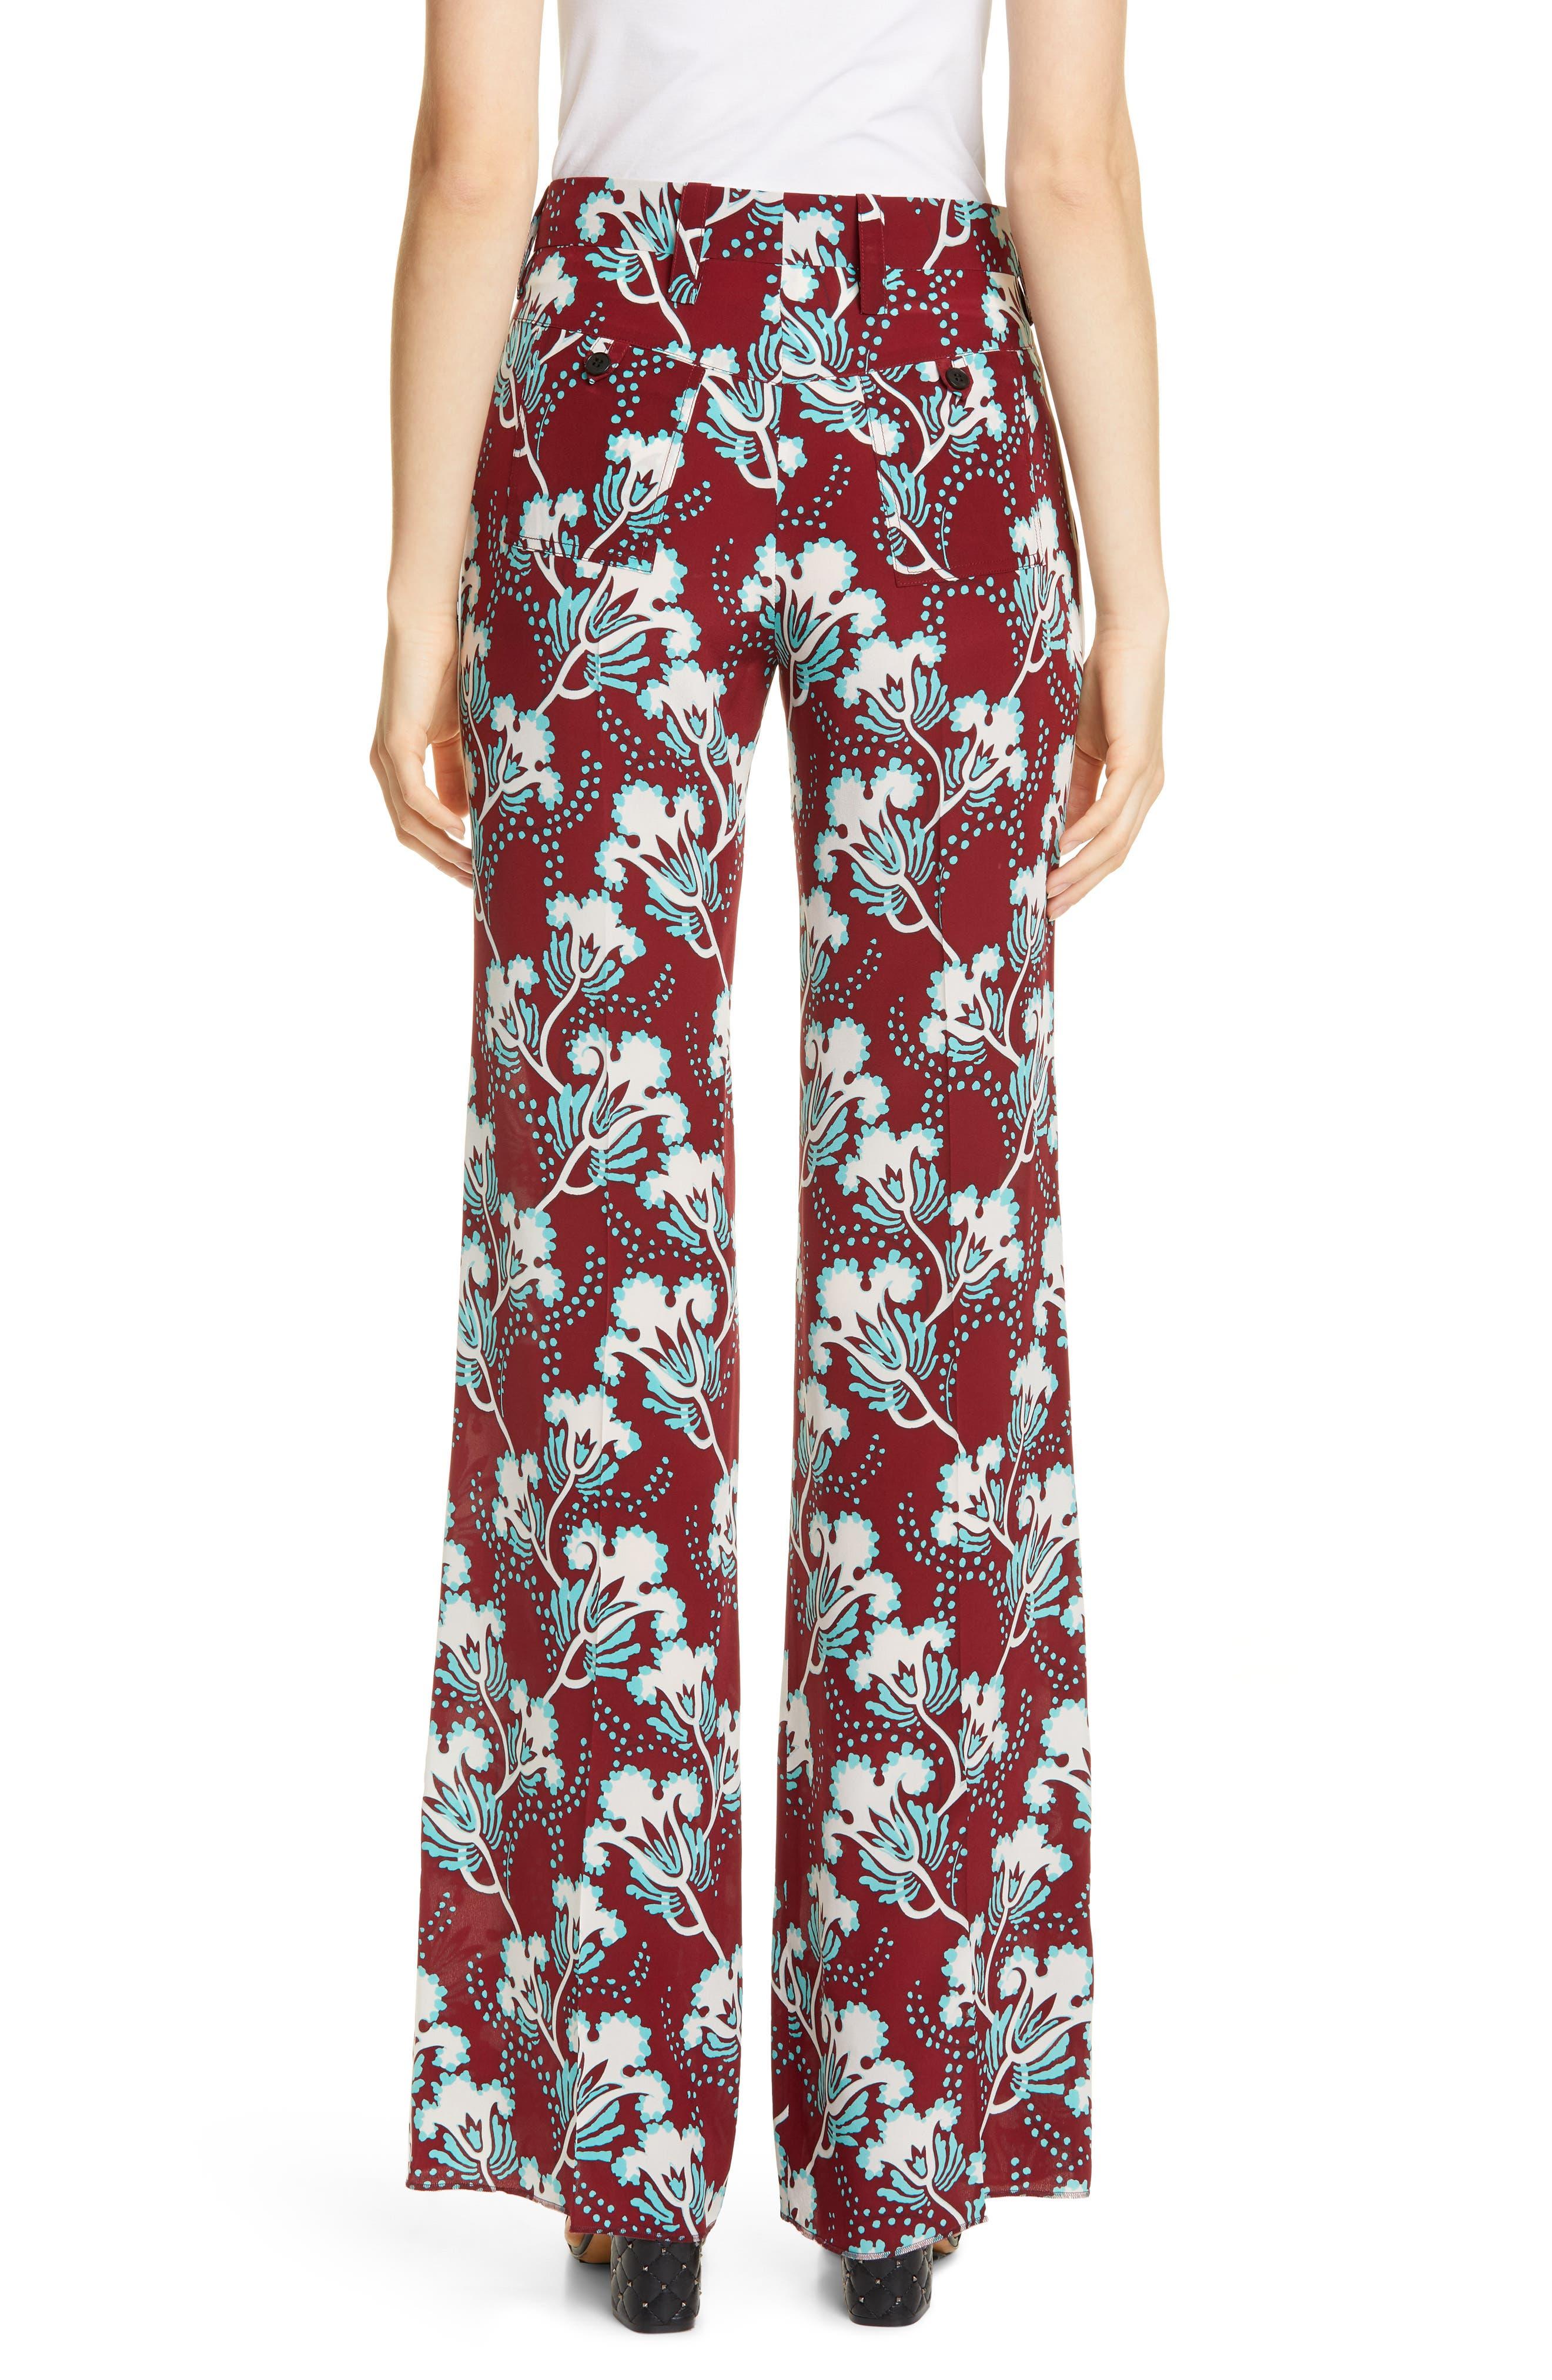 VALENTINO, Elderflower Print Wide Leg Silk Pants, Alternate thumbnail 2, color, GTB-GARNET/TURCHESE/BIANCO